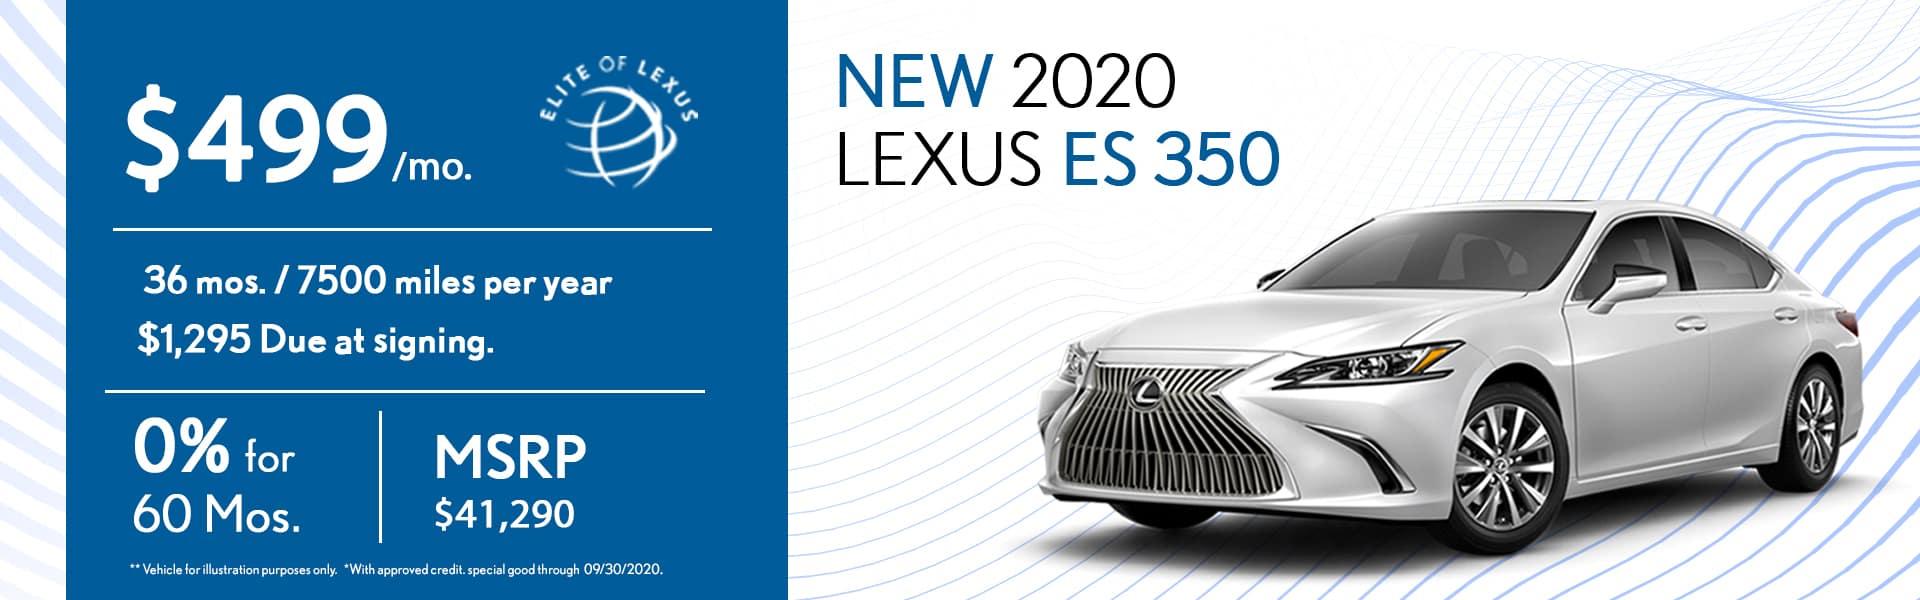 2020 Lexus ES 350 special